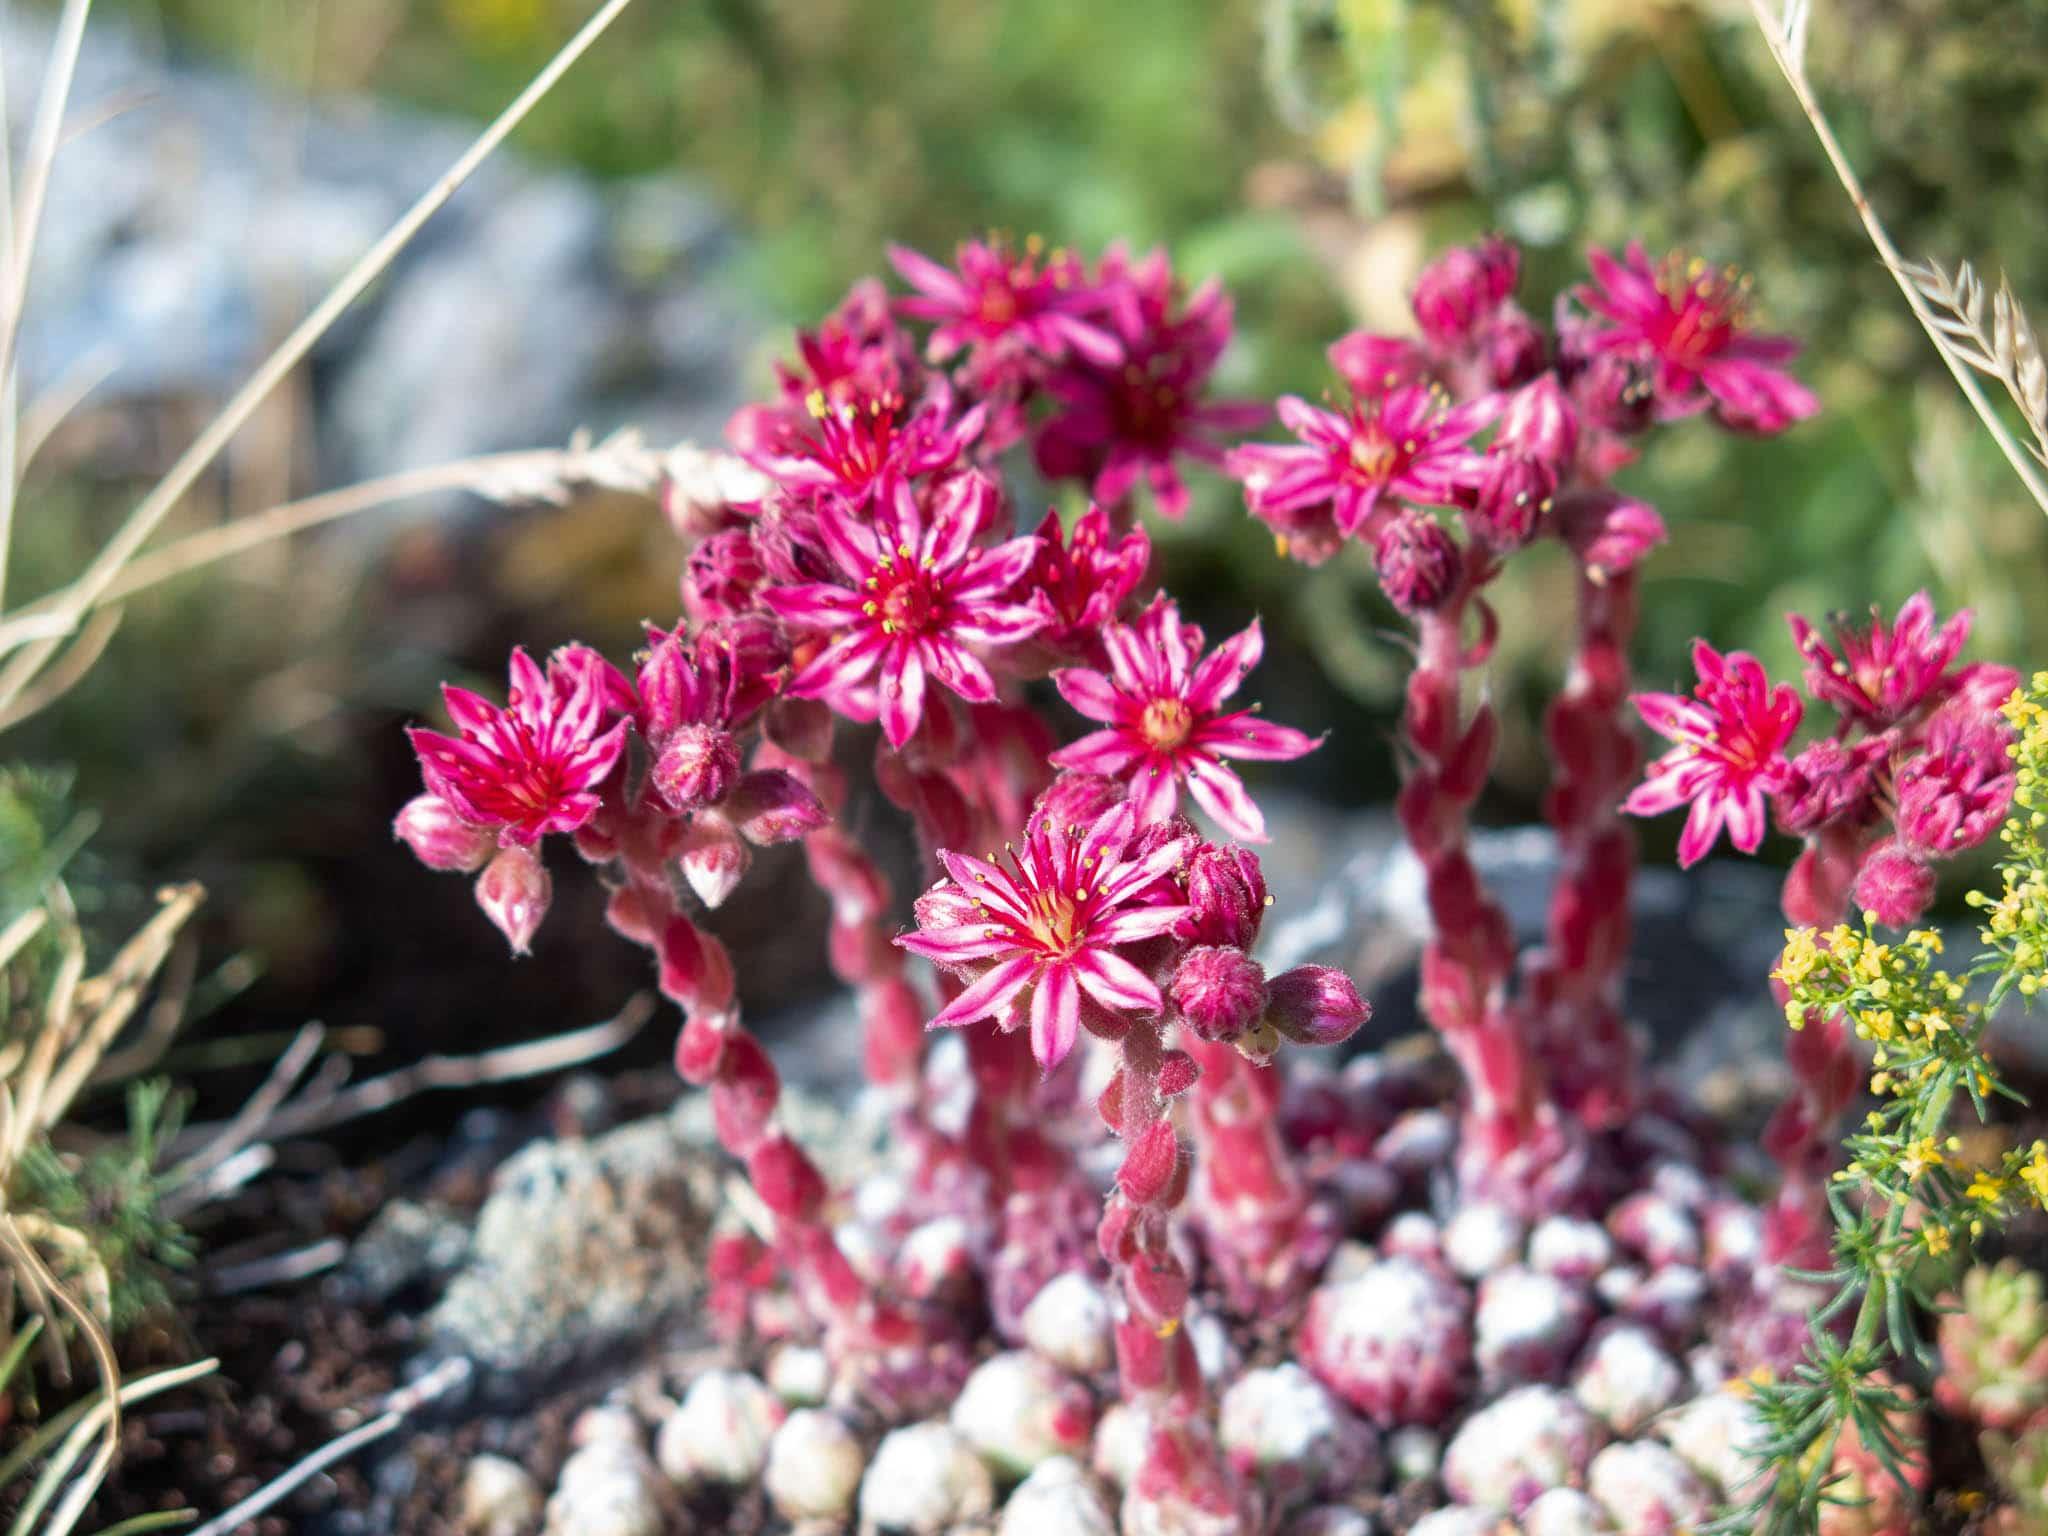 Pinkfarbene Blüten, Steingarten, Andorra